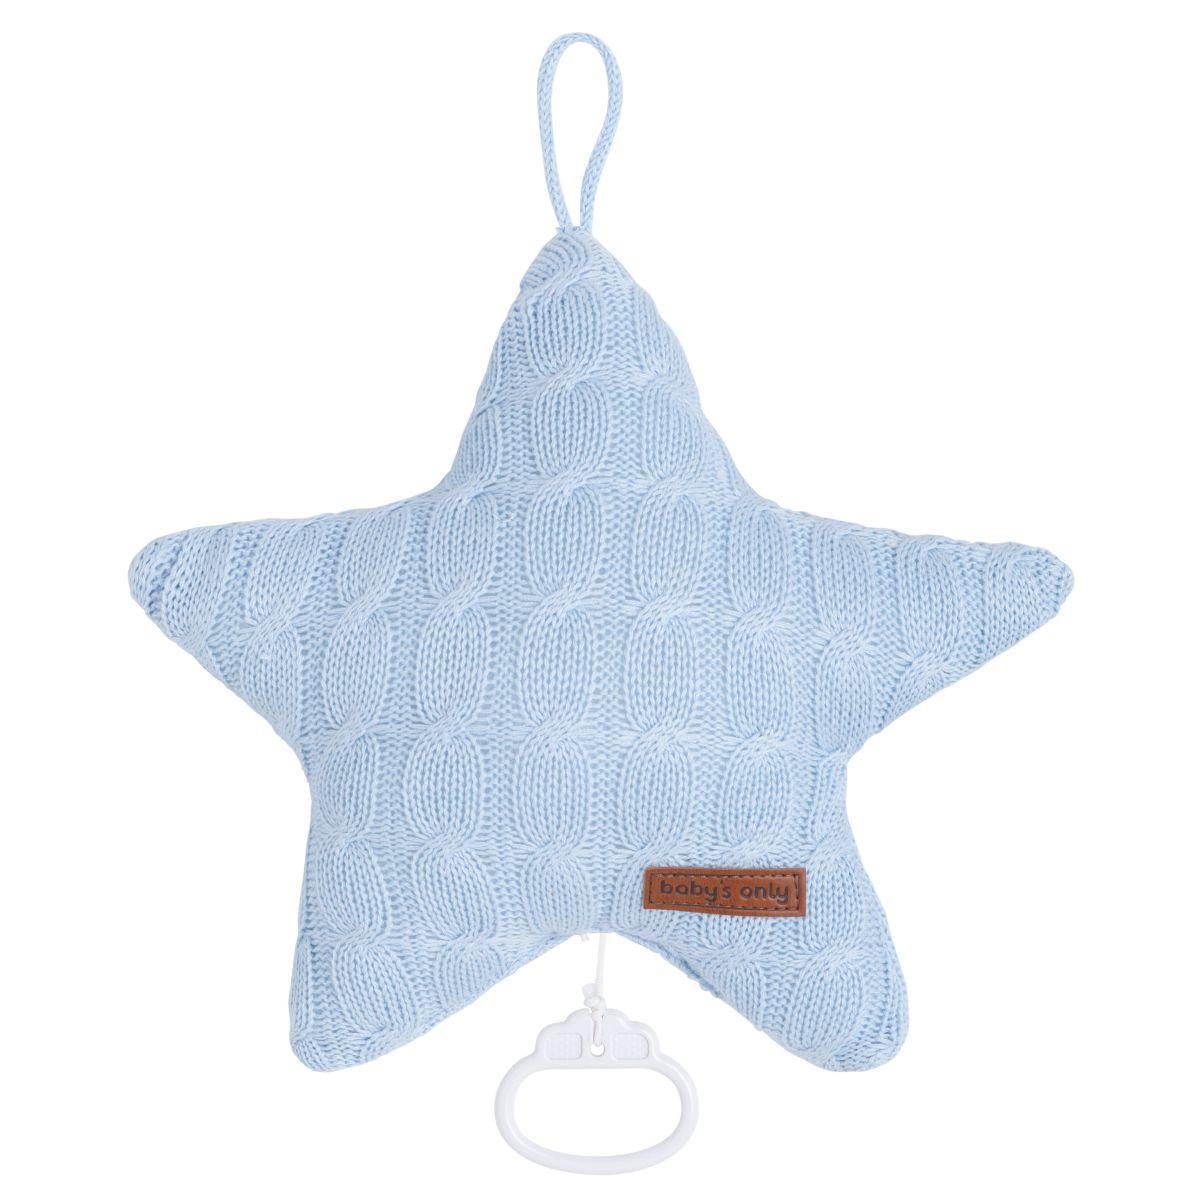 babys only 0132920 muziekdoos ster cable baby blauw 1